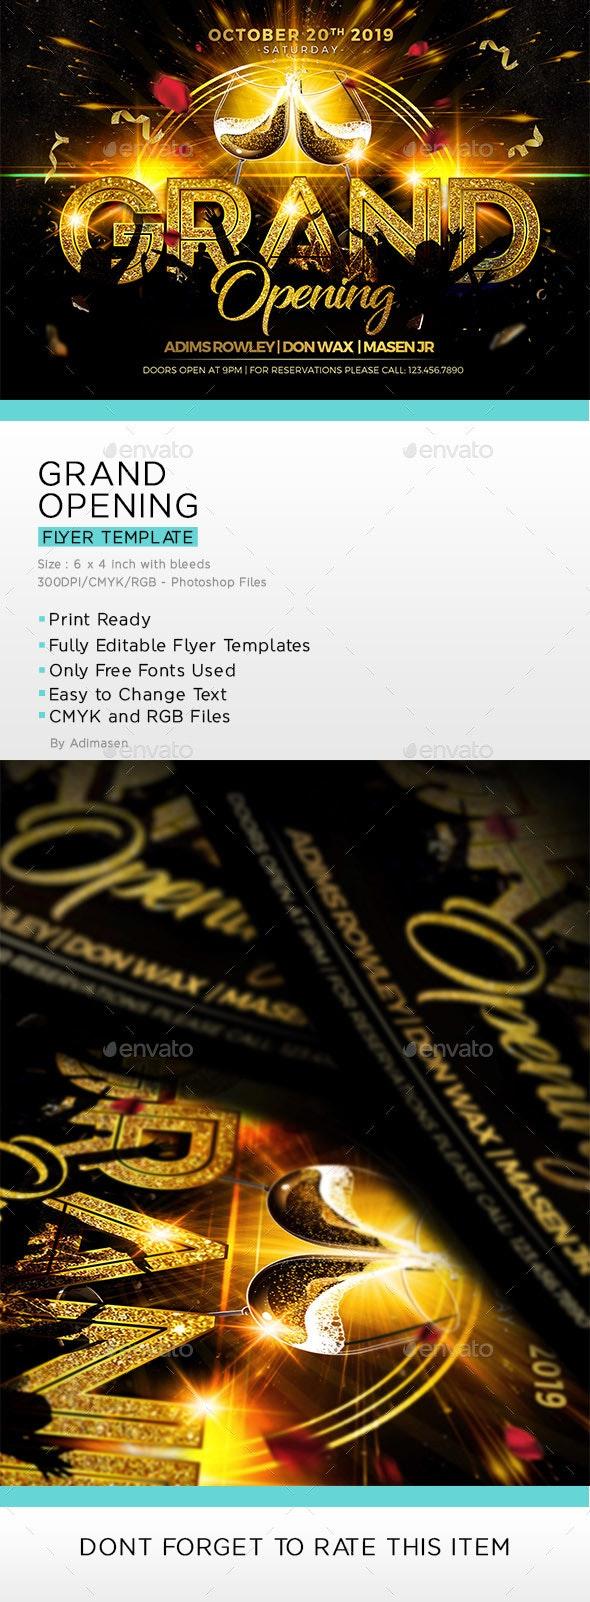 فایل لایه باز بنر Grand Opening Flyer